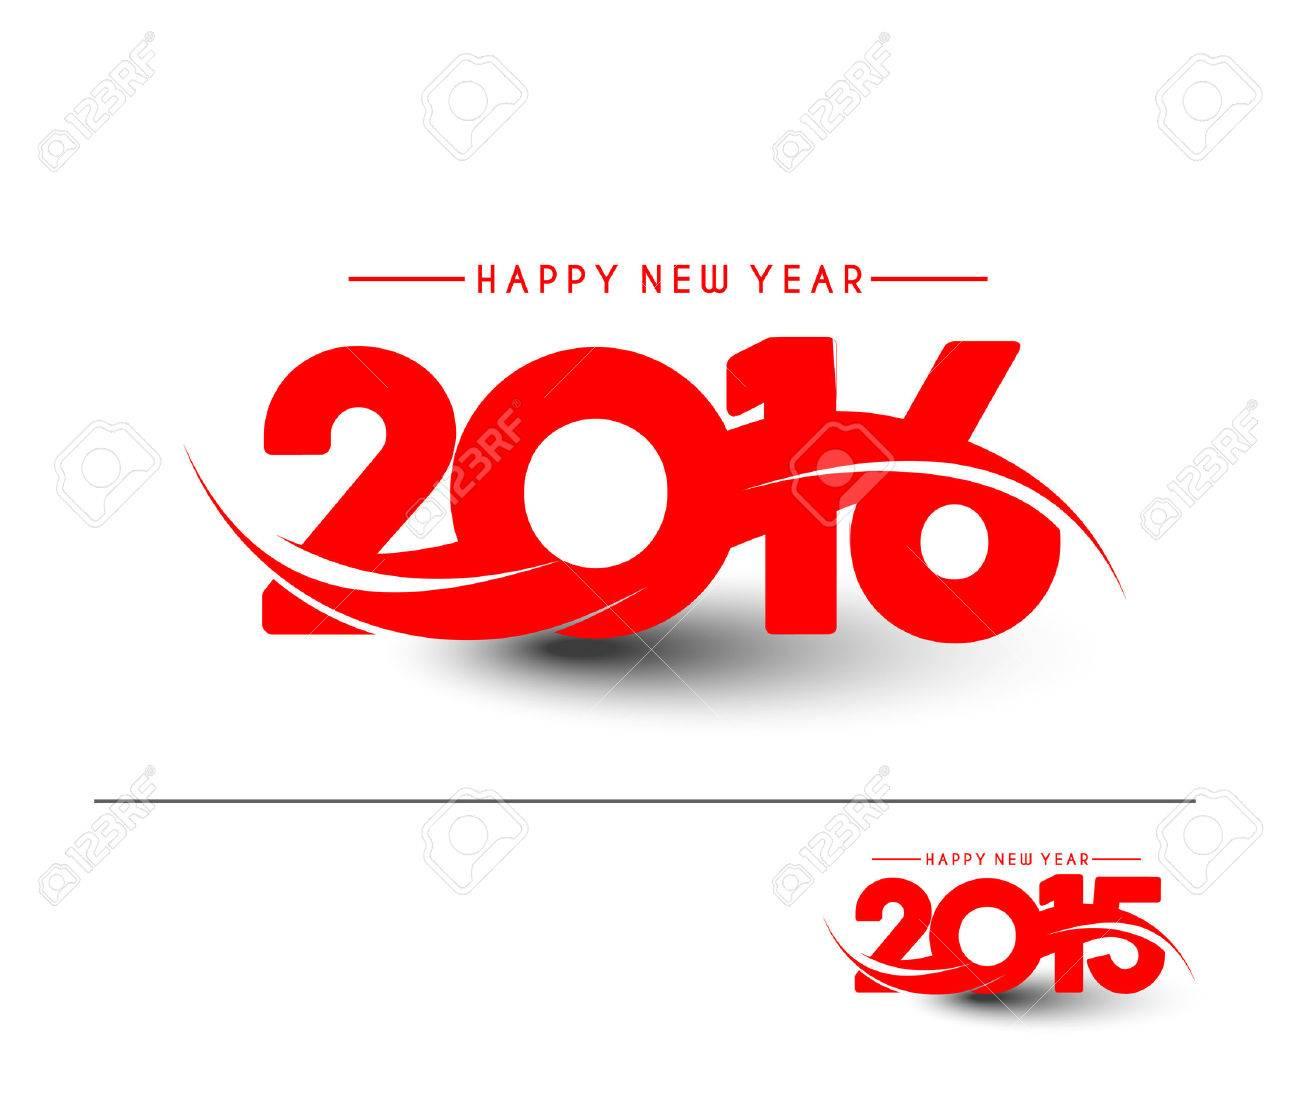 Happy new year 2016 Text Design Stock Vector - 47391764